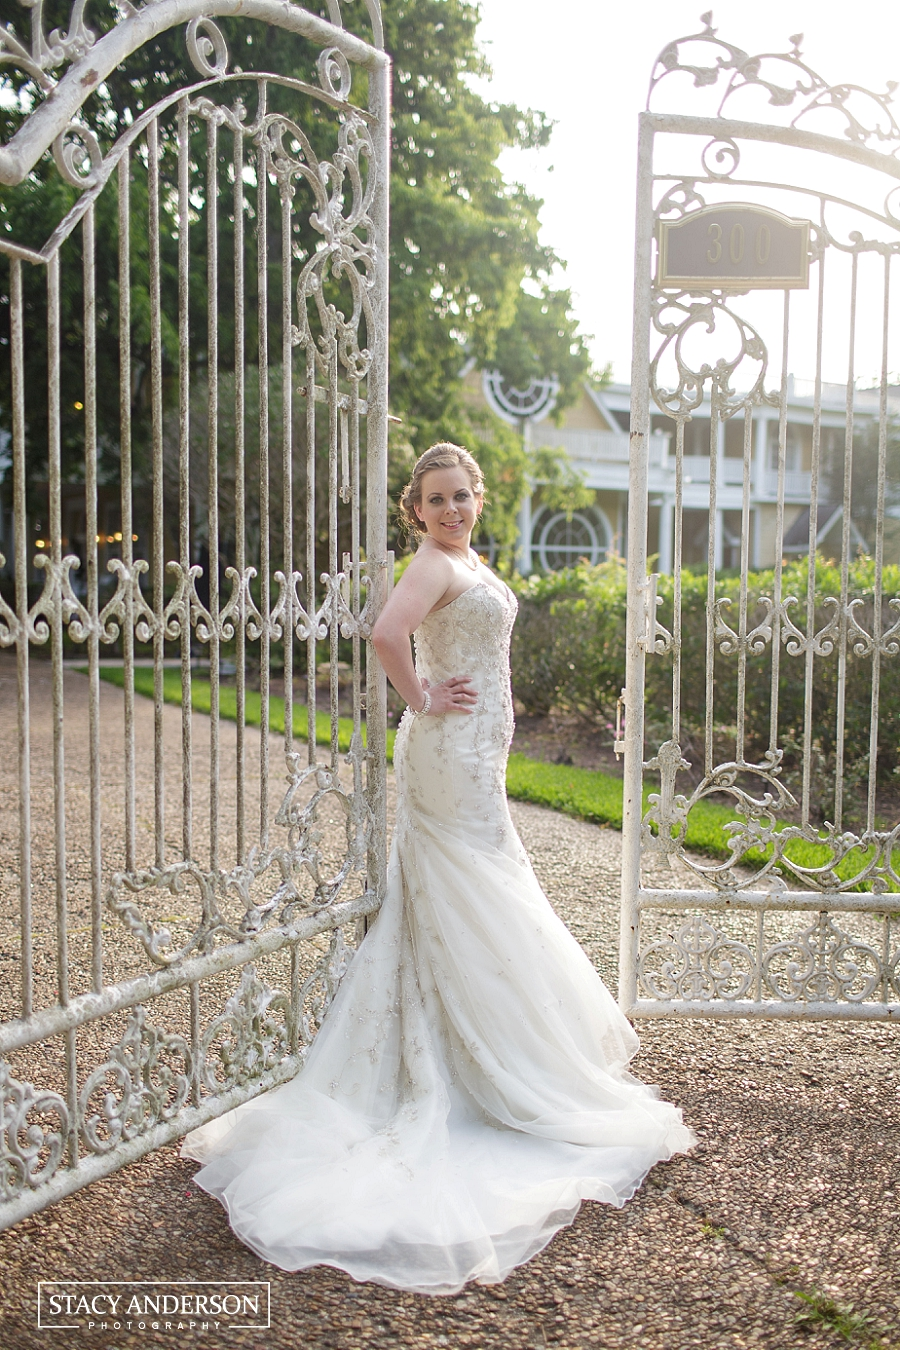 Stacy Anderson Photography Heaven on Earth Wedding Photographer_1698